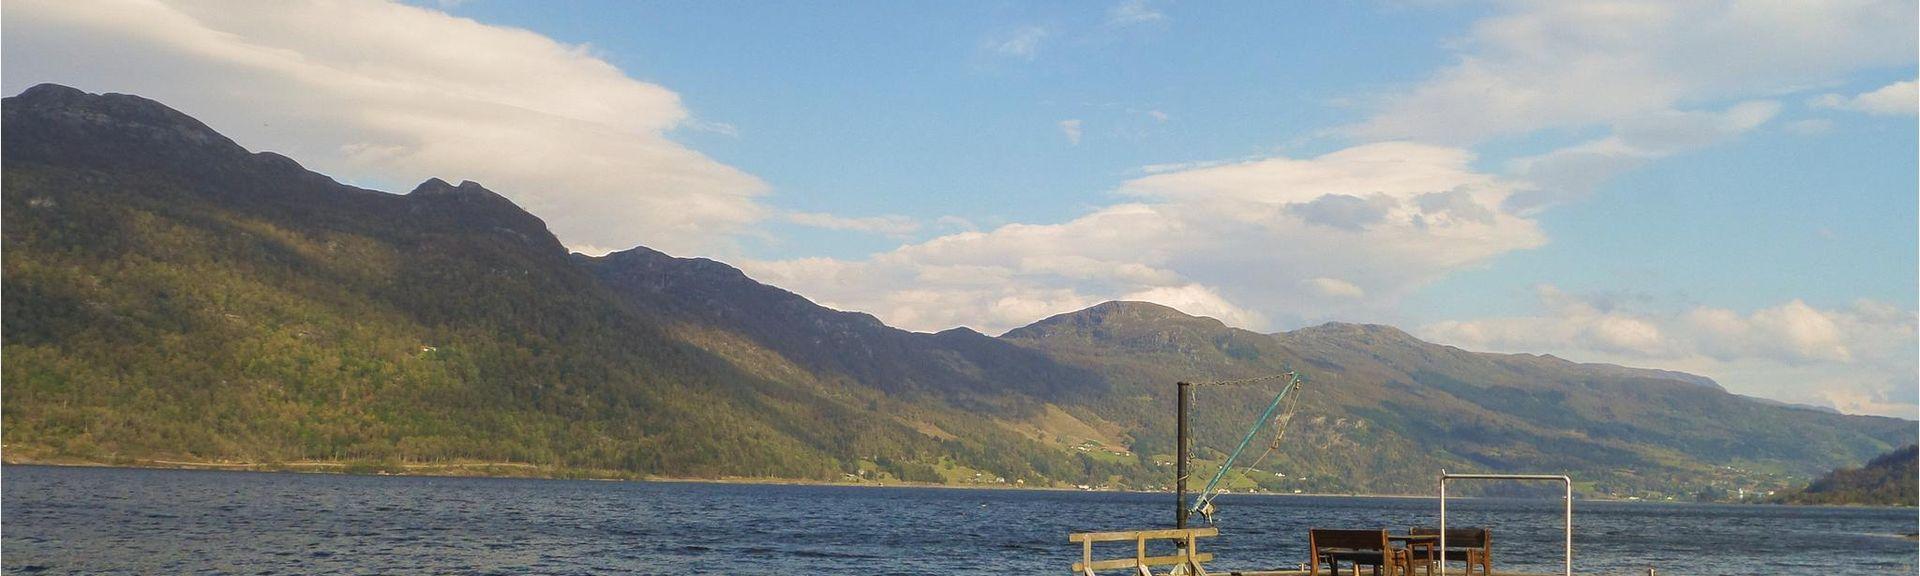 Vikebygd, Vindafjord, Rogaland (county), Norway